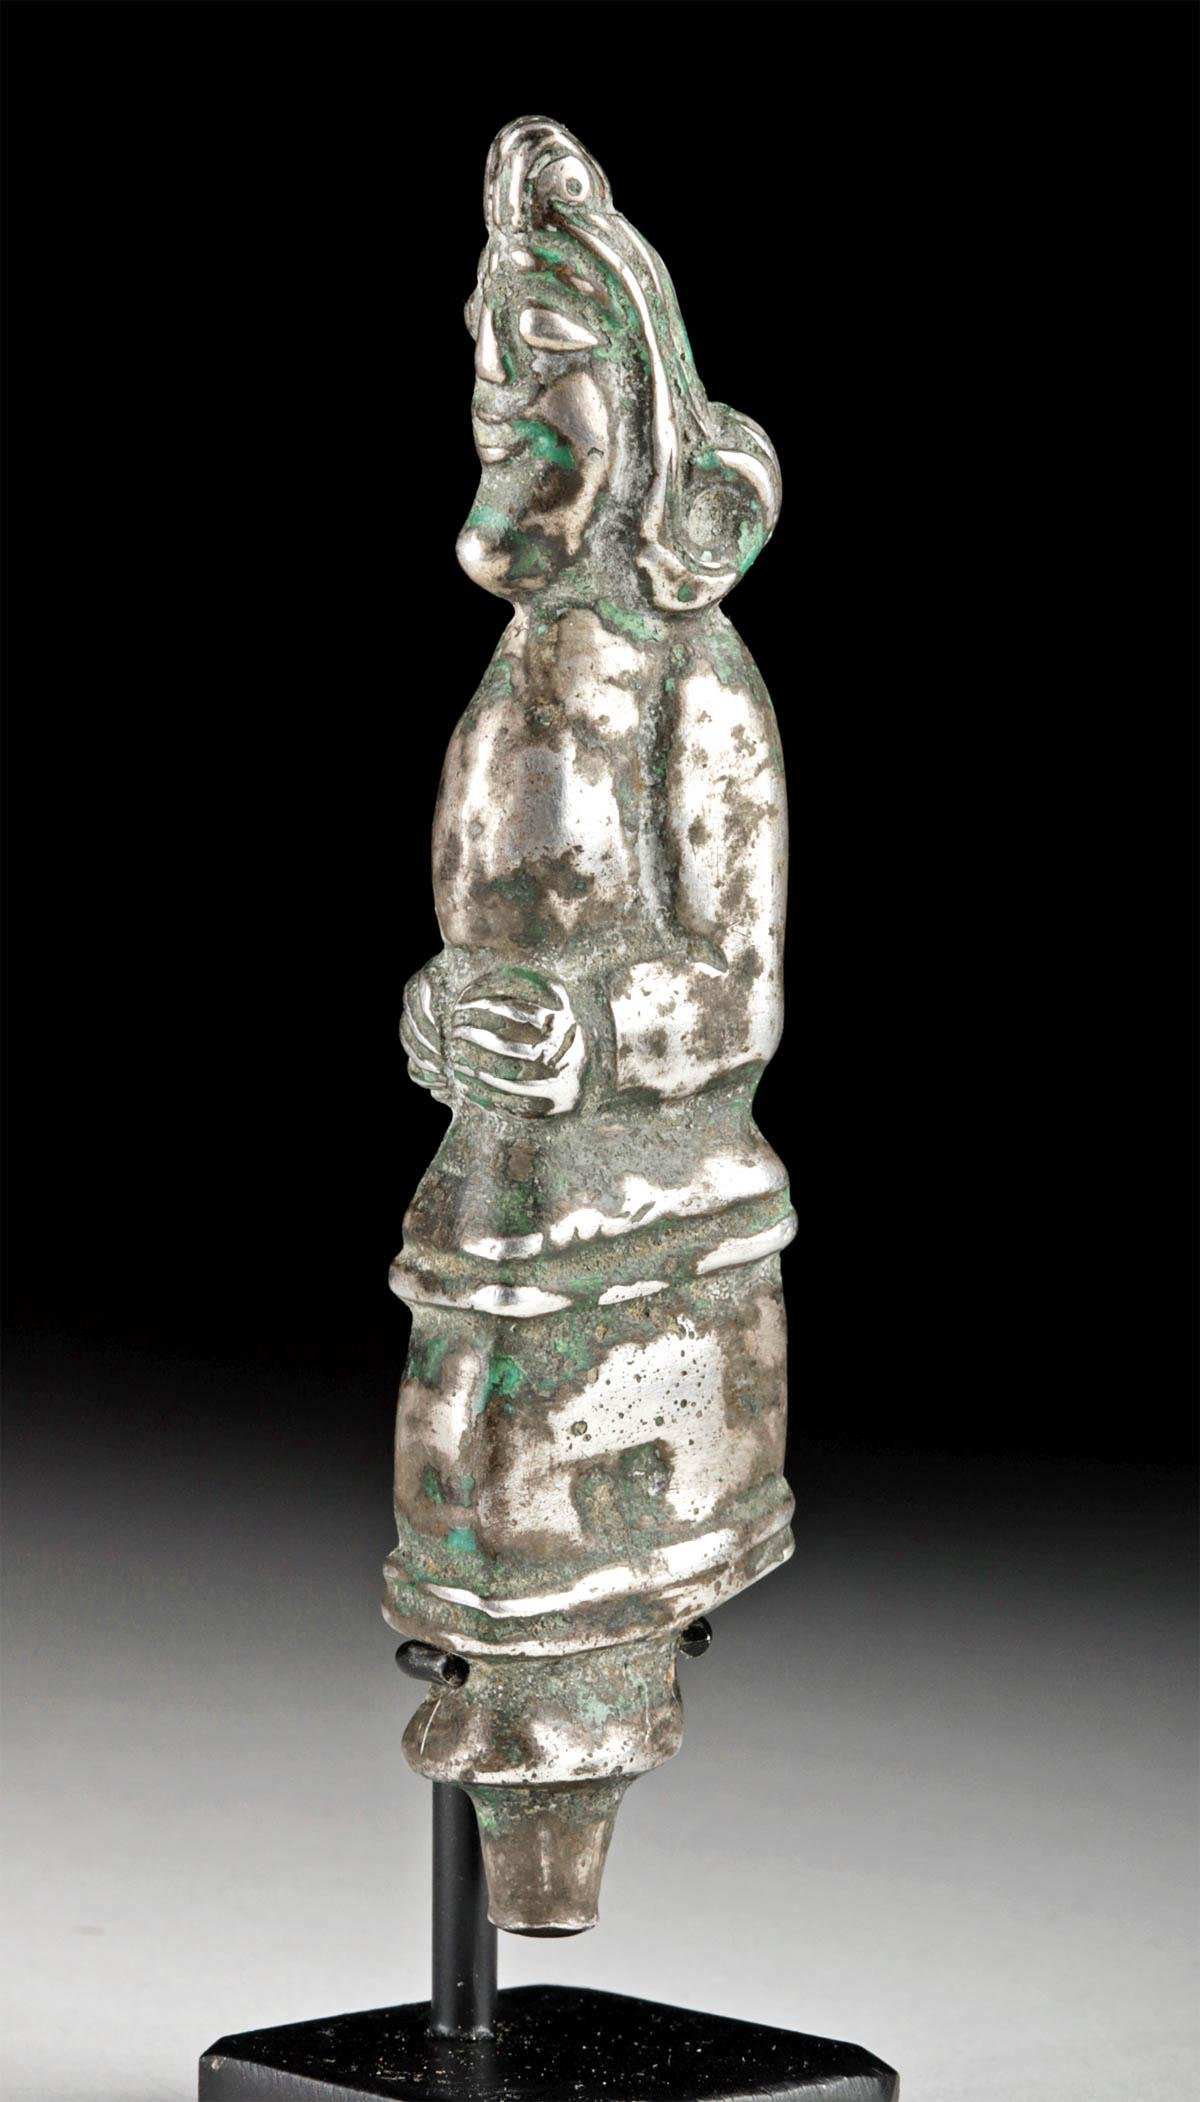 Parthian Silver Dagger Handle - Human Figure - 57.2 g